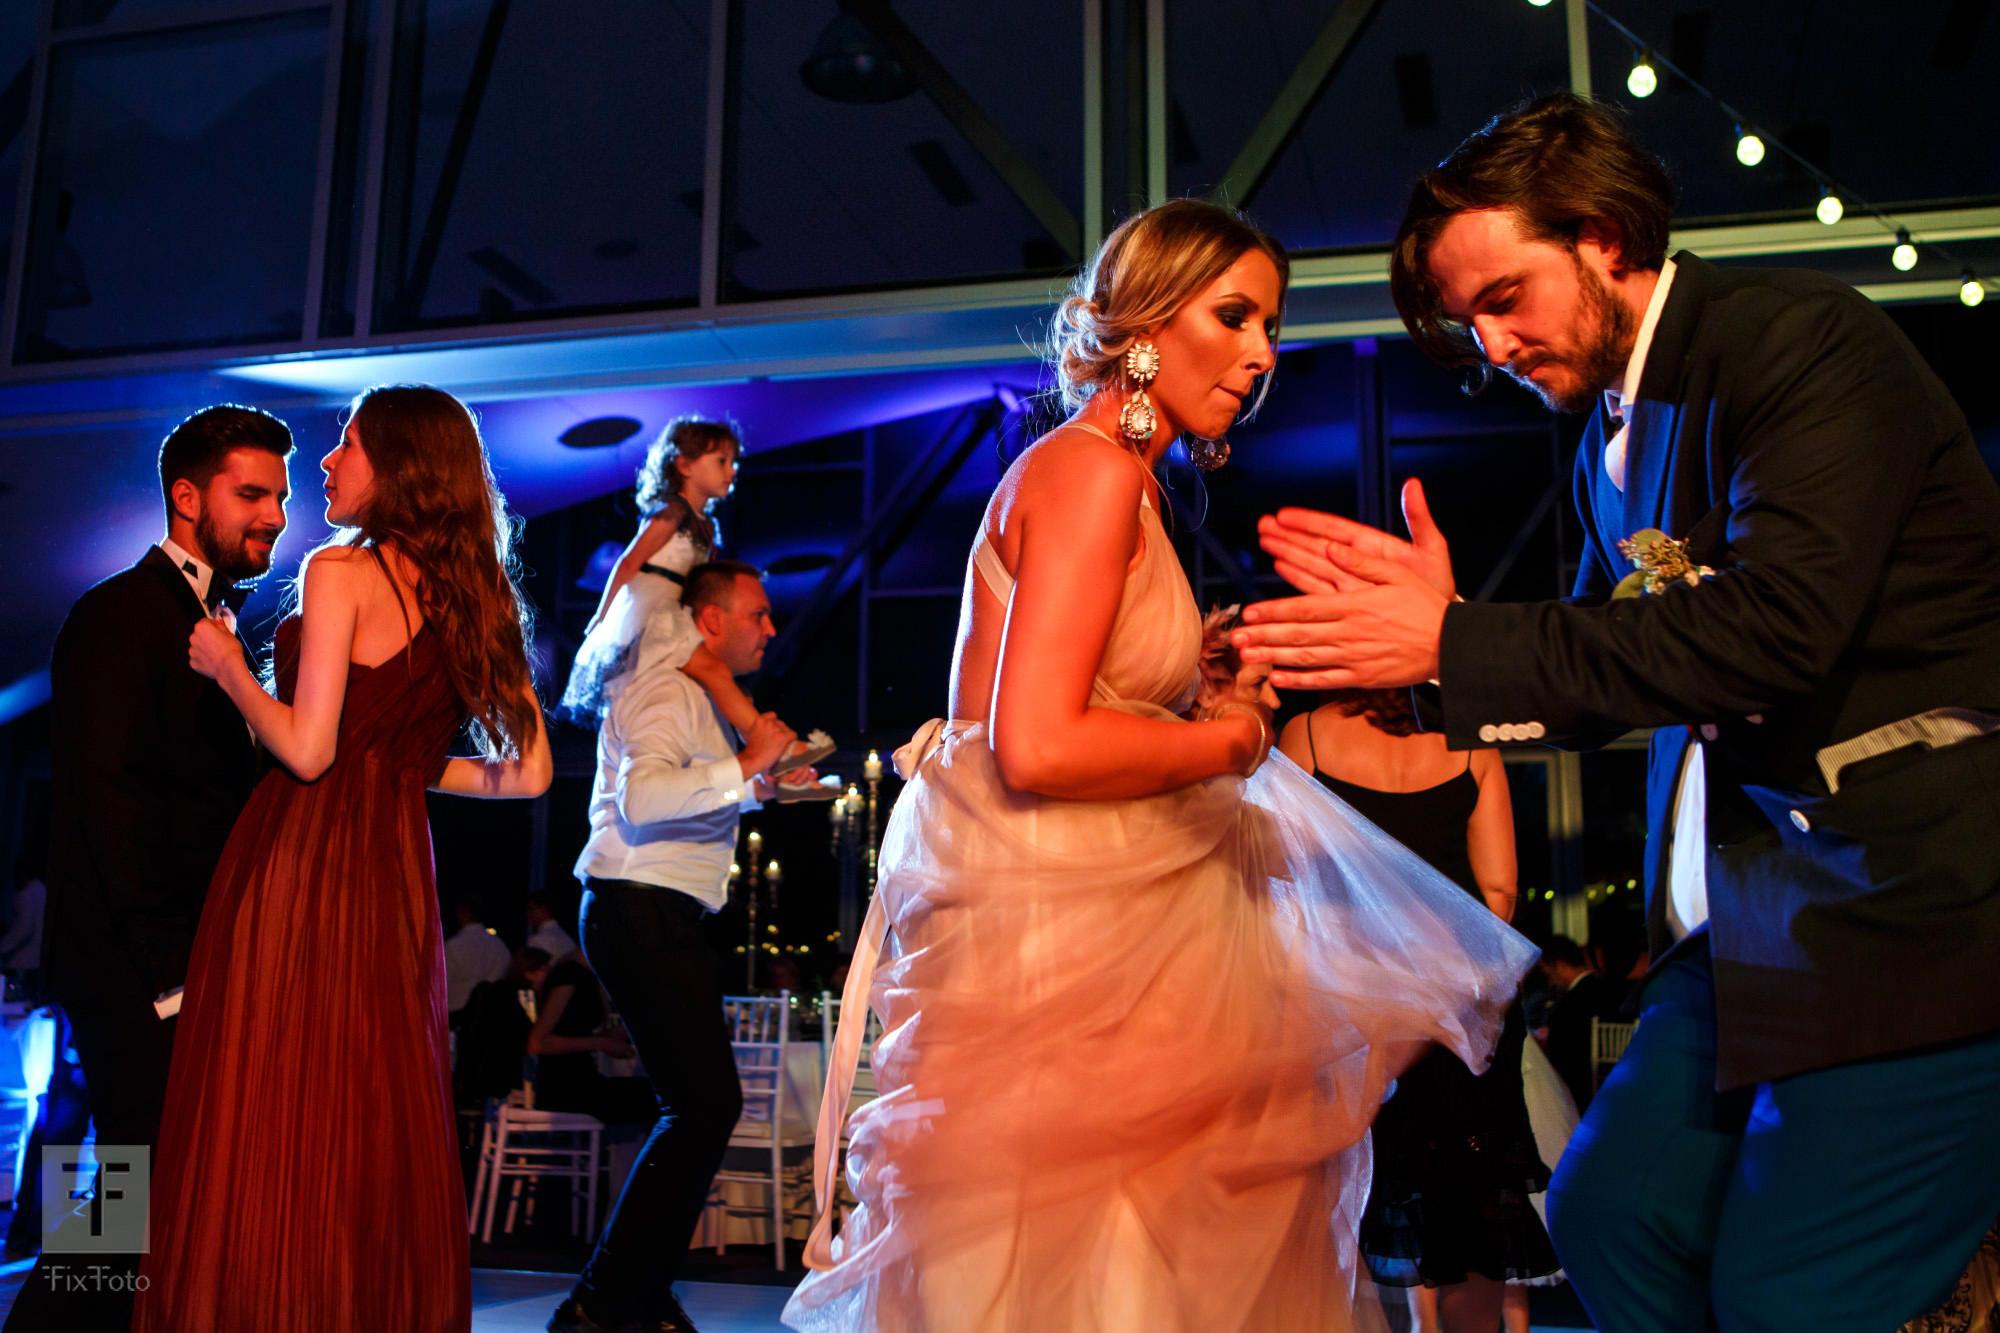 fotografi de nunta